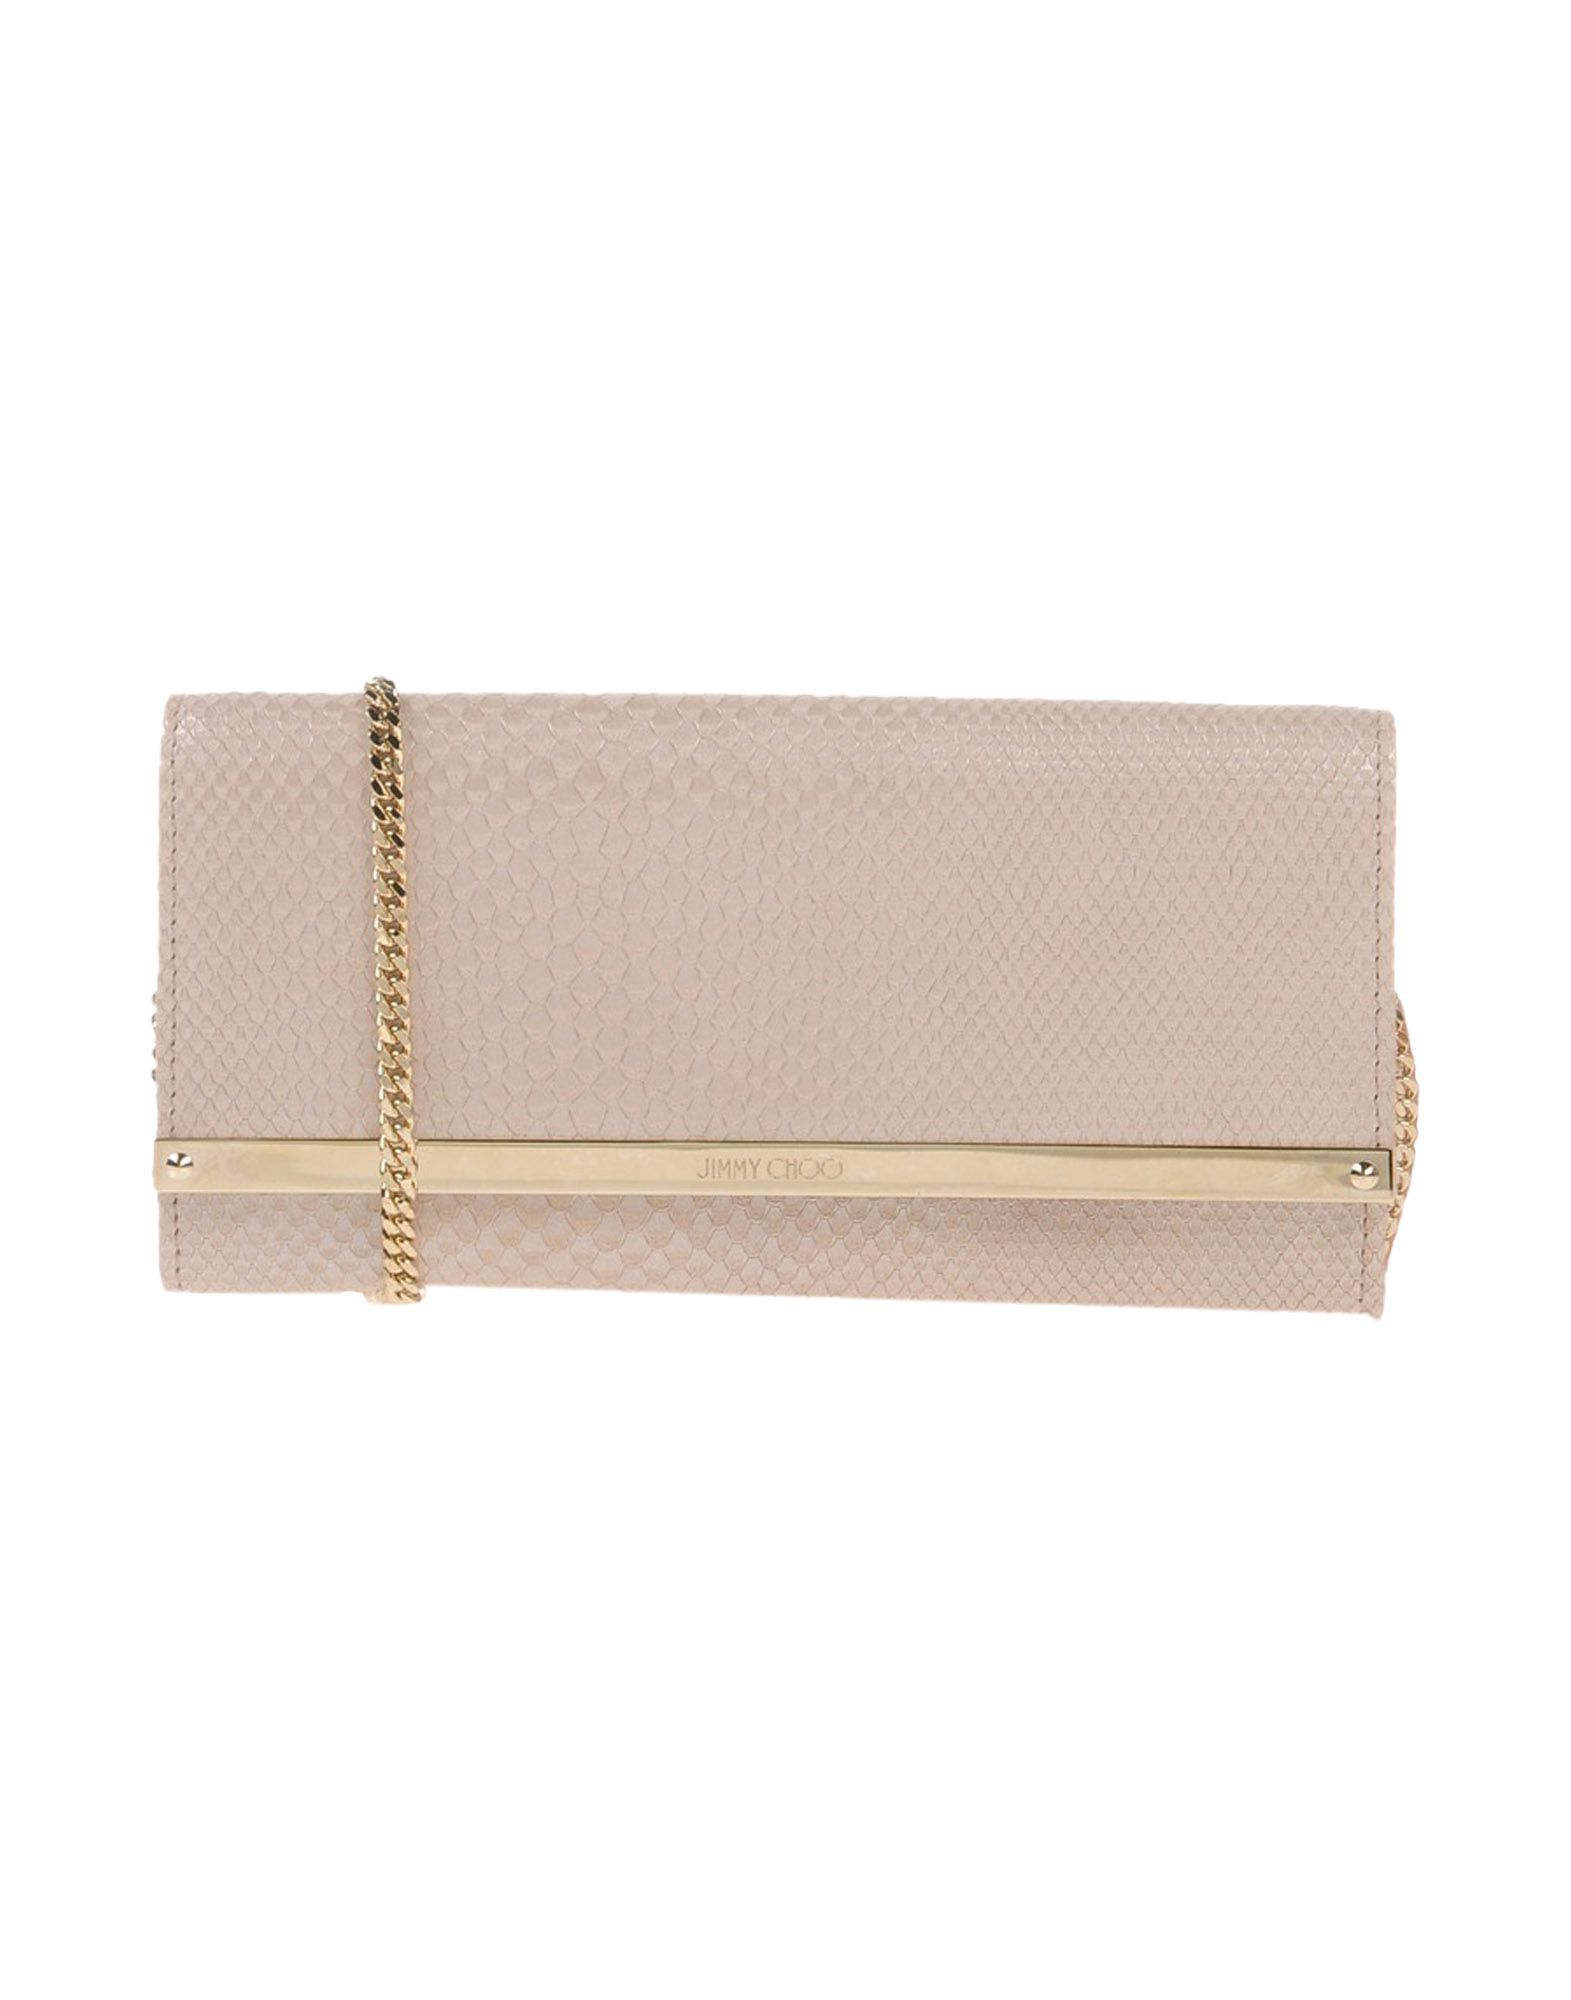 JIMMY CHOO LONDON Handbags